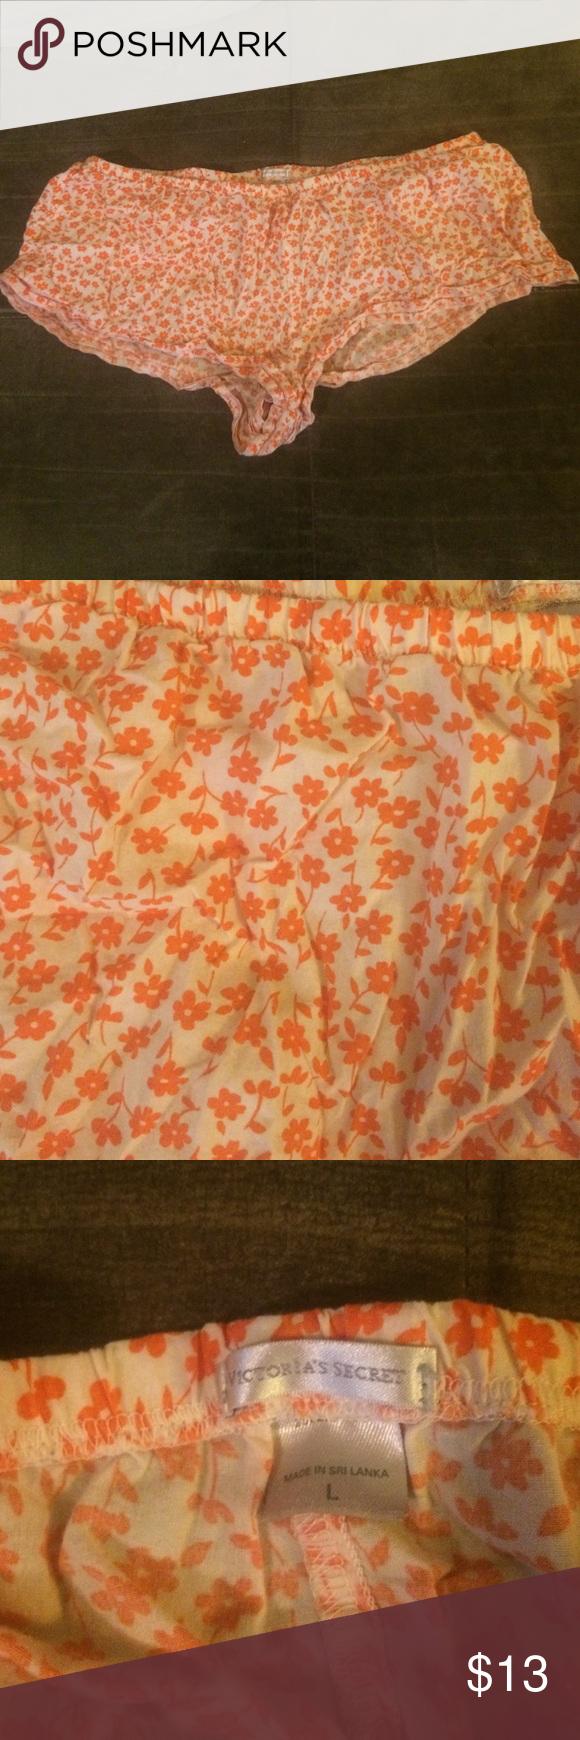 Victoria's Secret short cotton sleep shorts White with orange flowers, gently worn Victoria's Secret Intimates & Sleepwear Pajamas